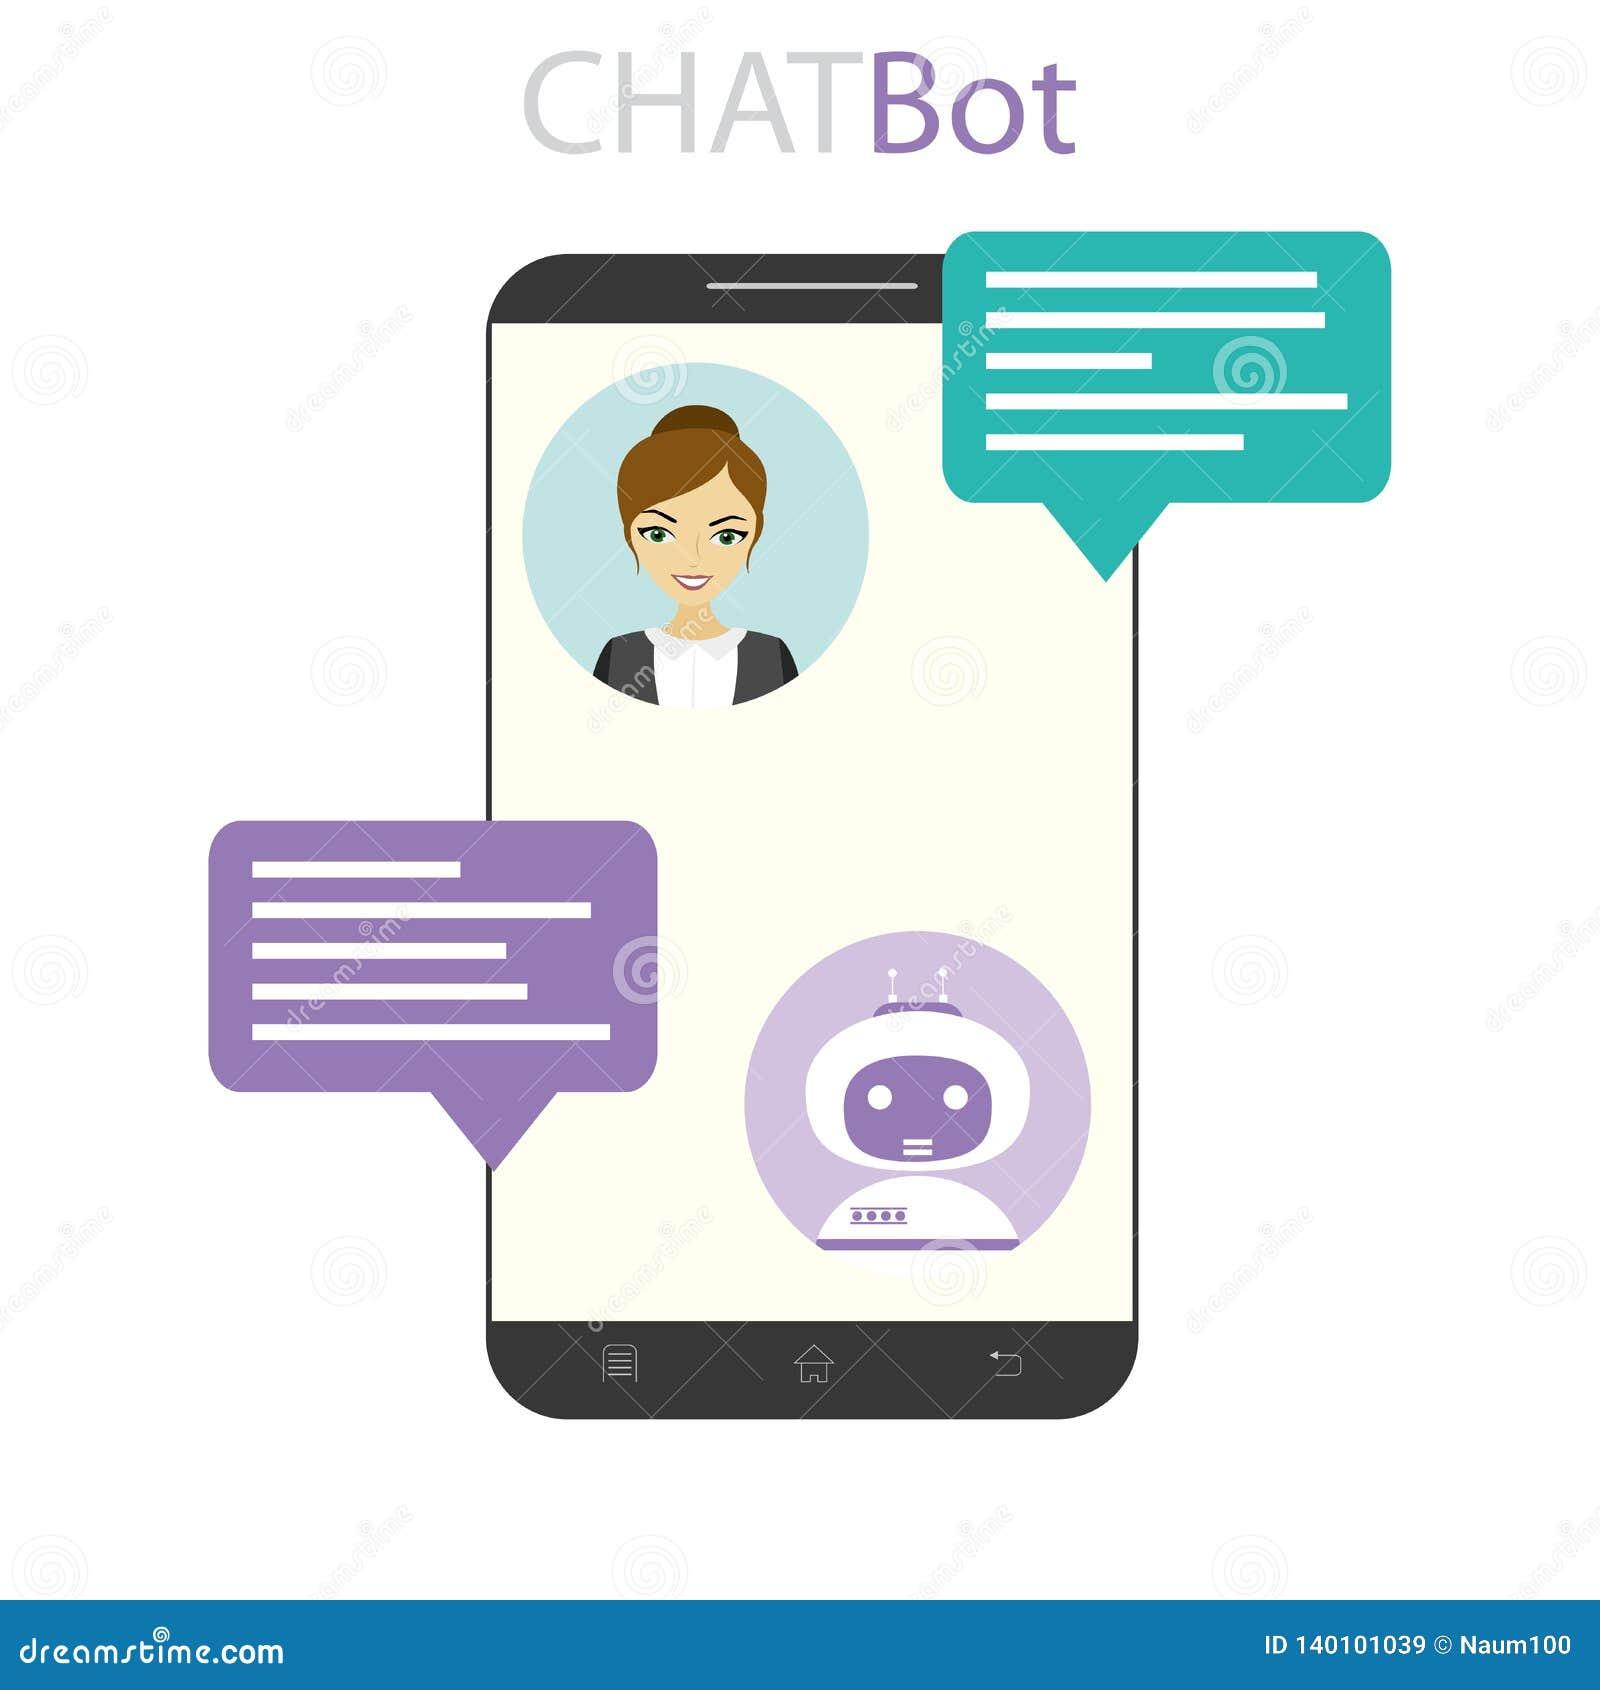 Fêmea e chatbot na tela do telefone celular